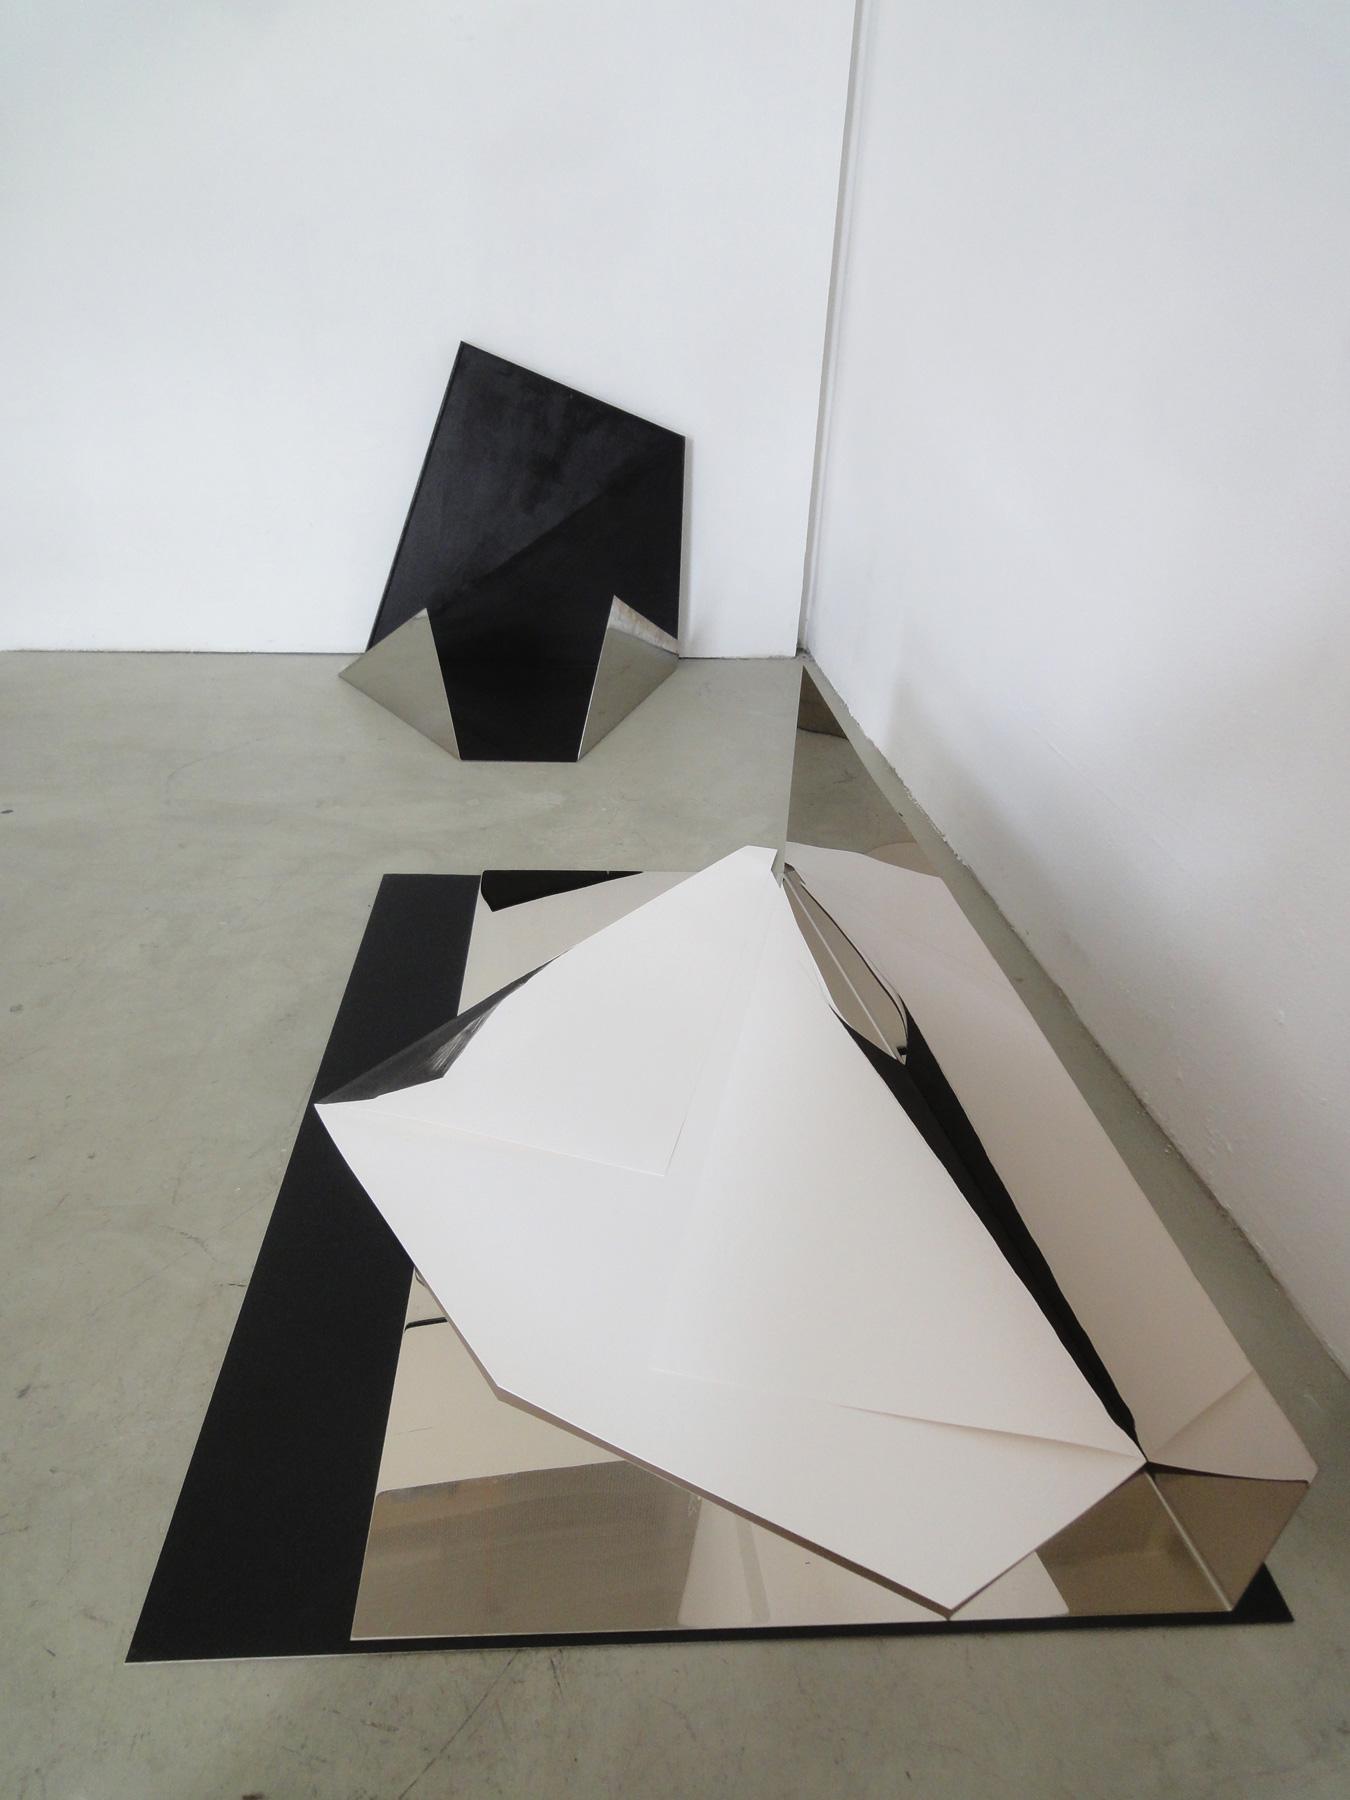 Nina Annabelle Märkl   Tangrammatics   Ink on folded paper cut outs mixed media   Installation   size flexible   2015